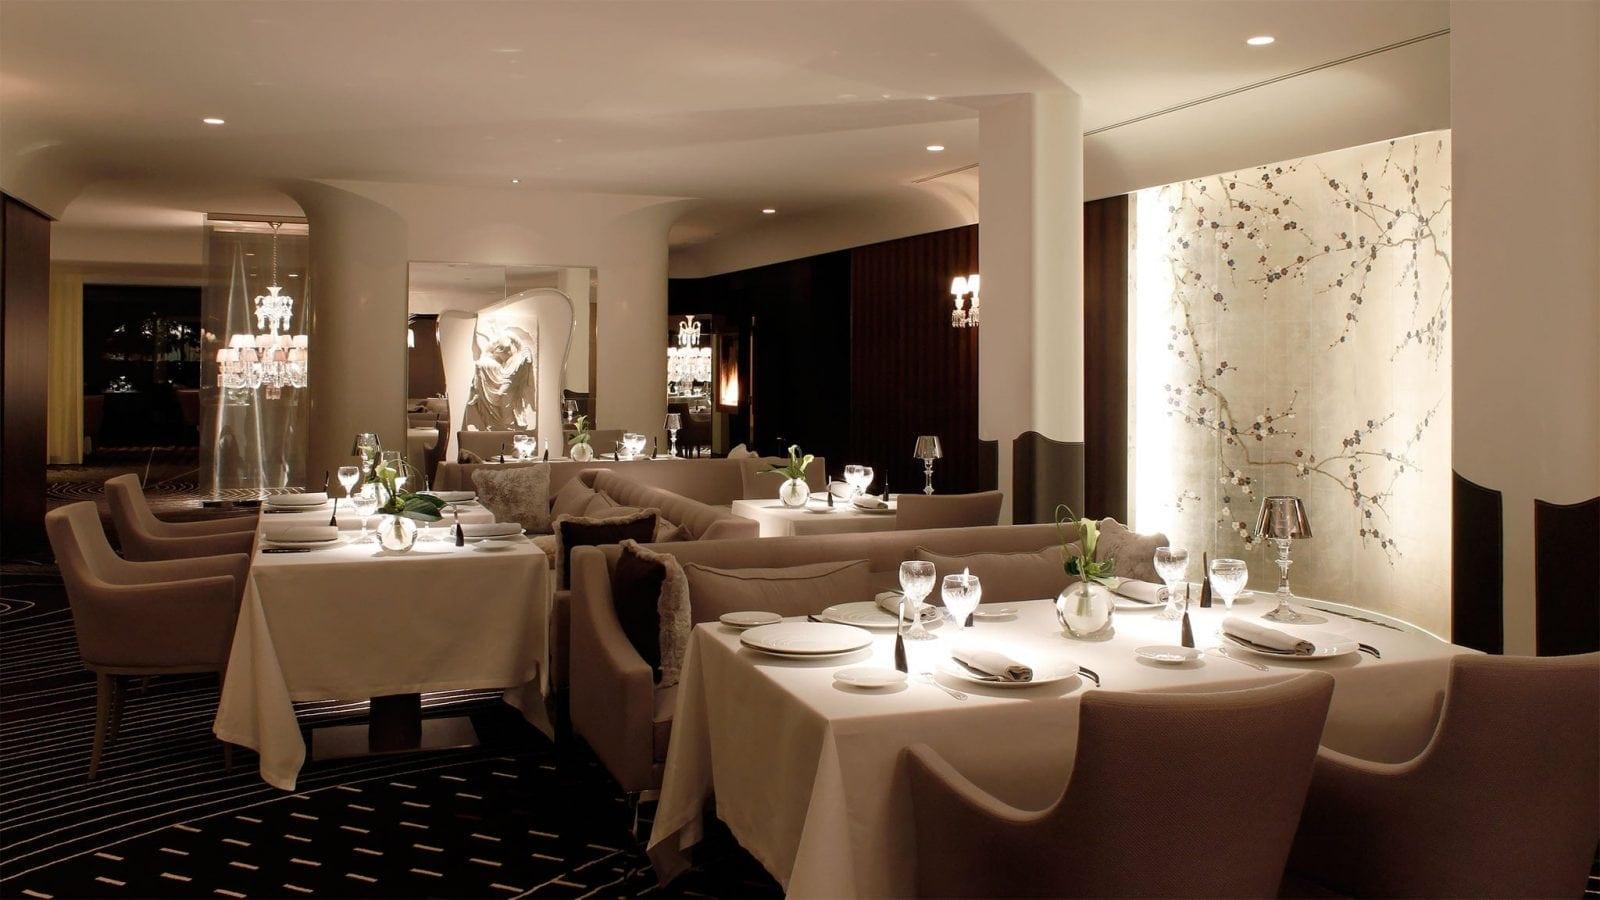 5.Restaurant Pic Valence France - Top 10 restaurante cu stele Michelin din Europa